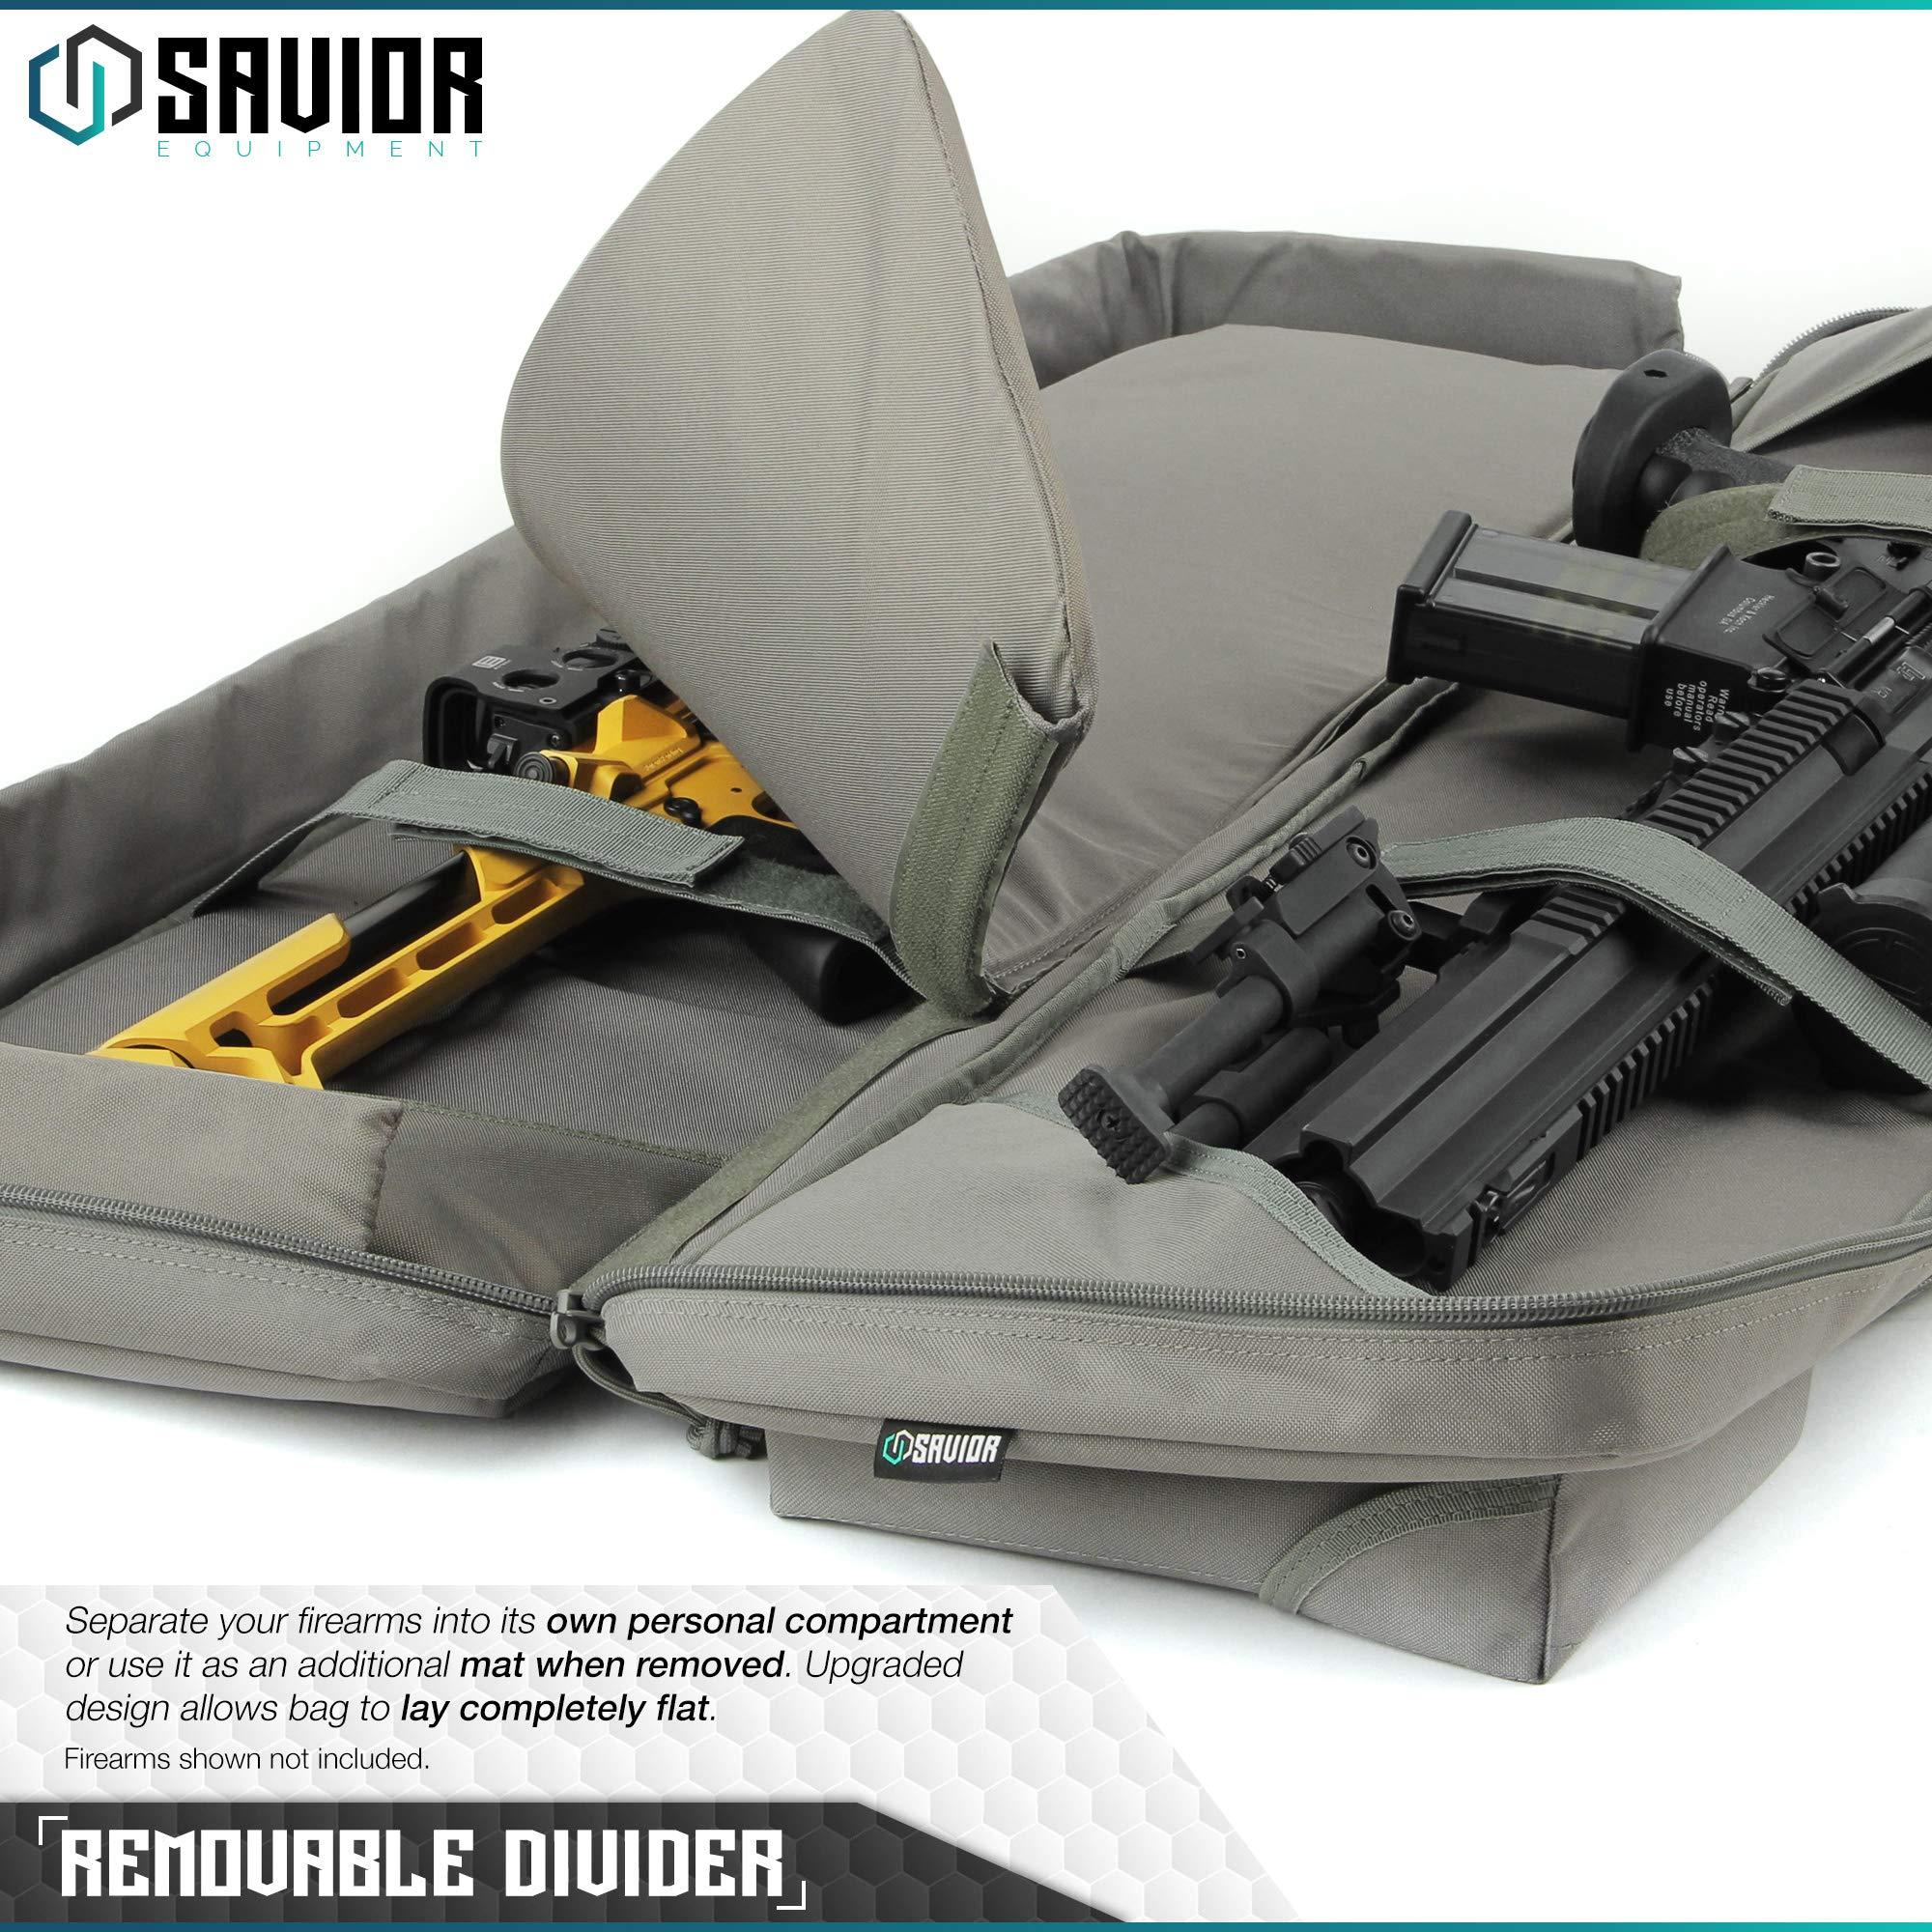 Savior Equipment Urban Warfare Tactical Double Carbine Long Rifle Bag Gun Case Firearm Backpack w/Pistol Handgun Case - 42 Inch Ash Gray by Savior Equipment (Image #3)